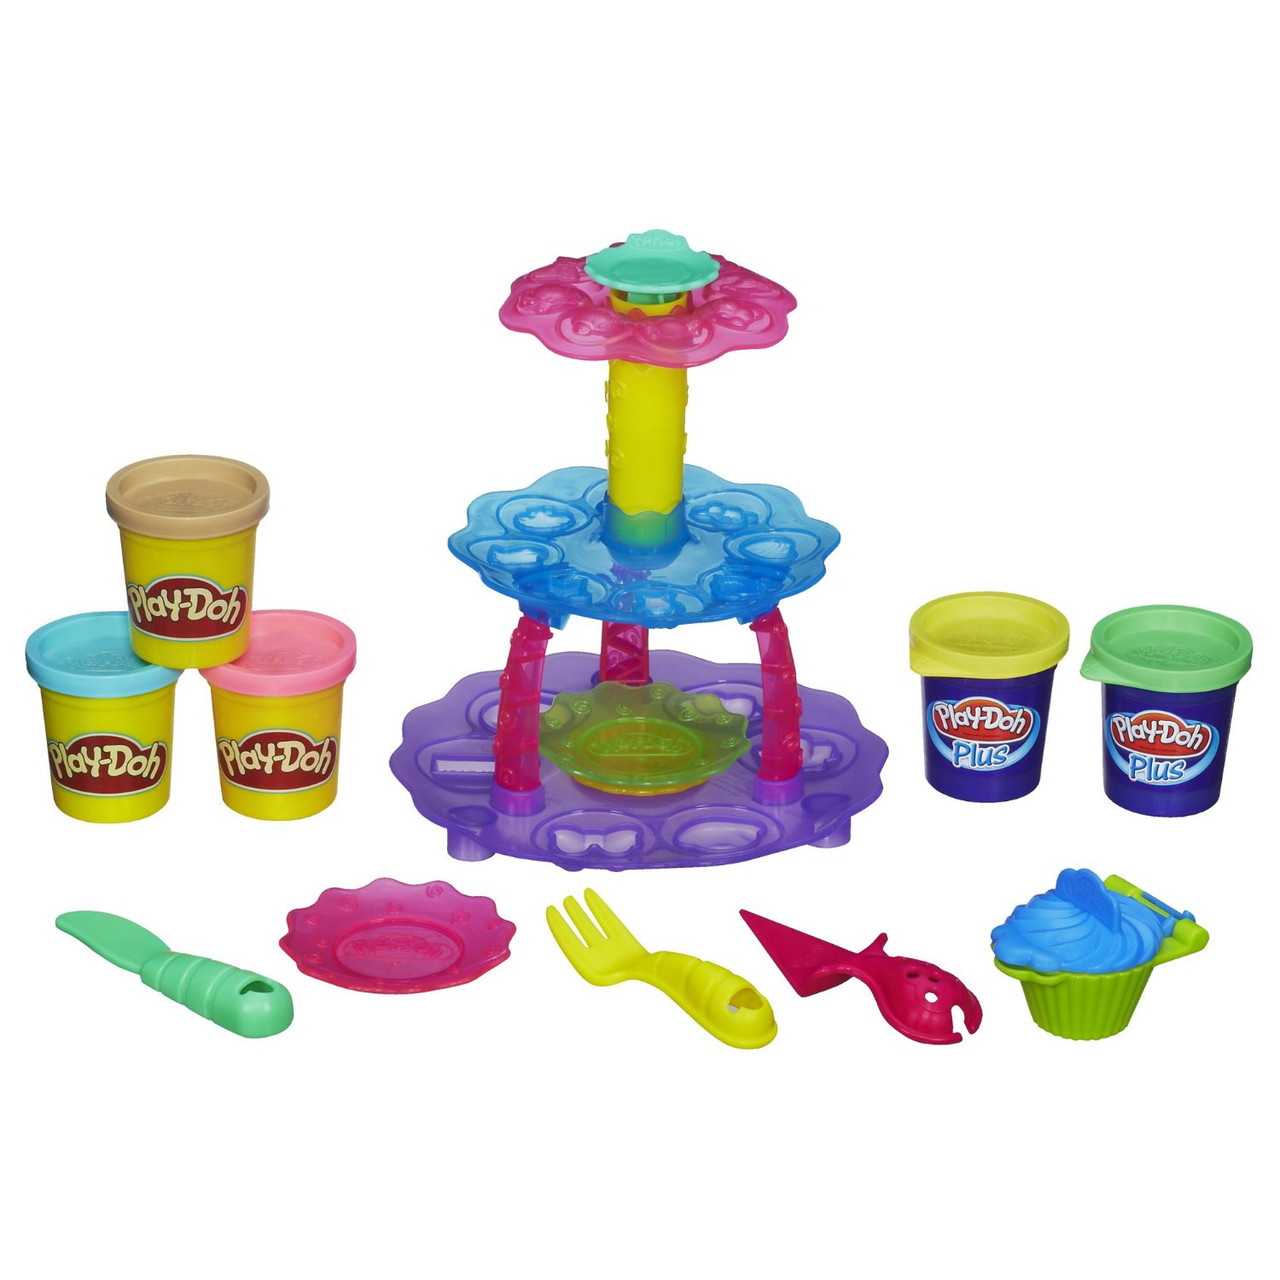 PLAY-DOH набор Башня из кексов  Sweet Shoppe Cupcake Tower